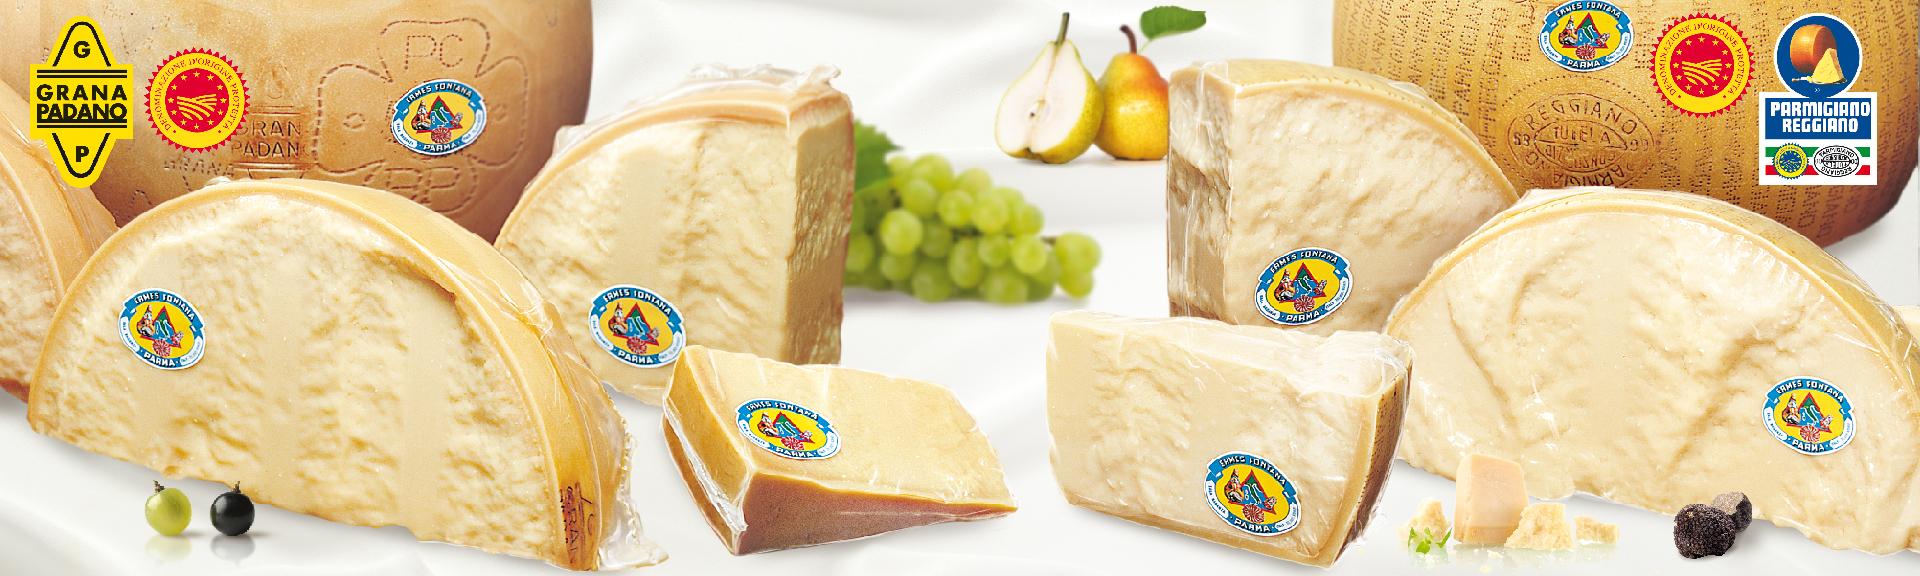 Salumificio Fontana formaggio